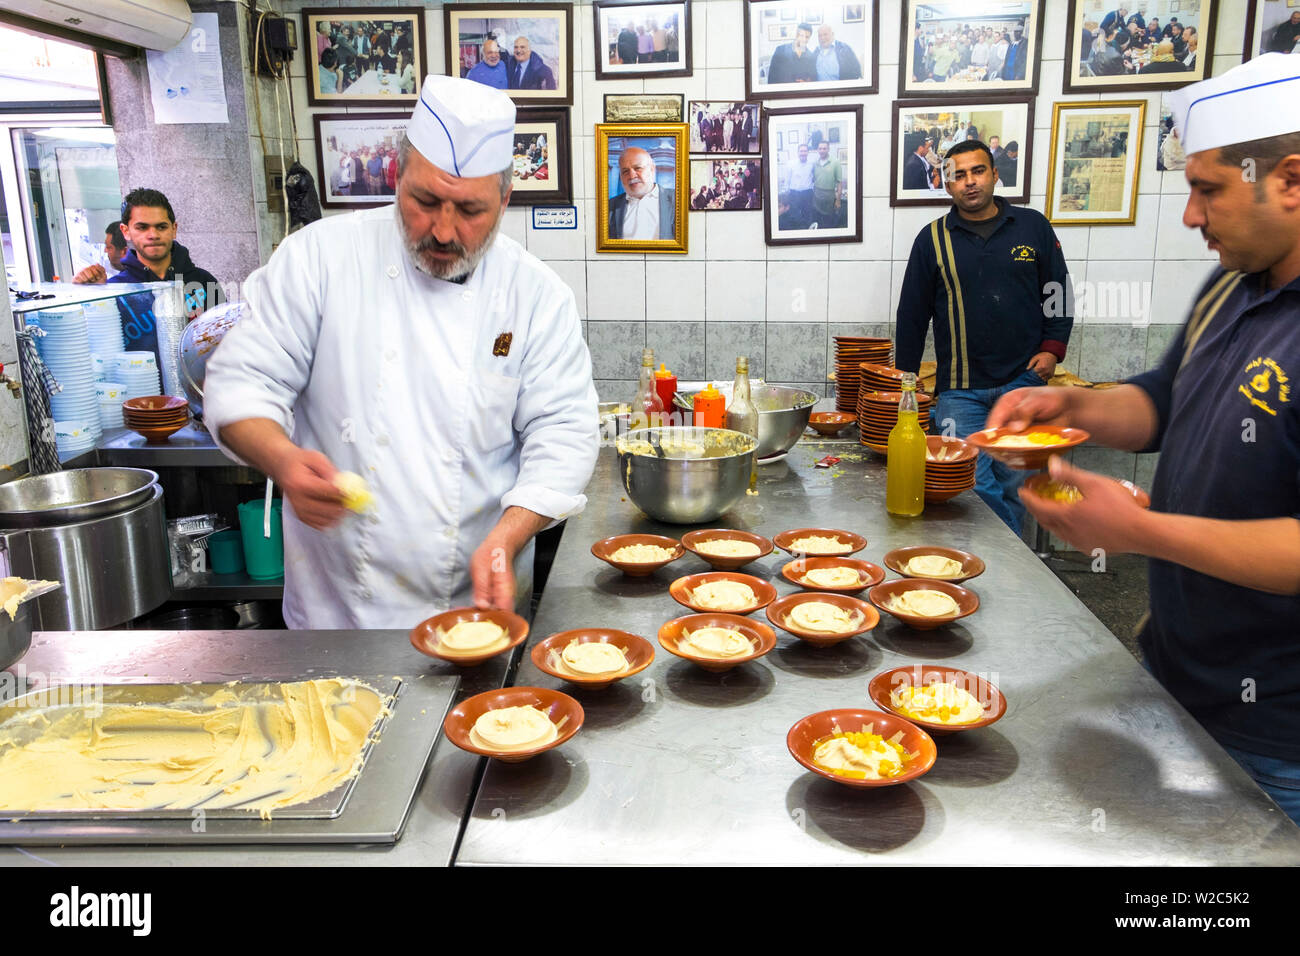 congestión captura Hacer la cama  Amman Jordan Restaurant High Resolution Stock Photography and Images - Alamy